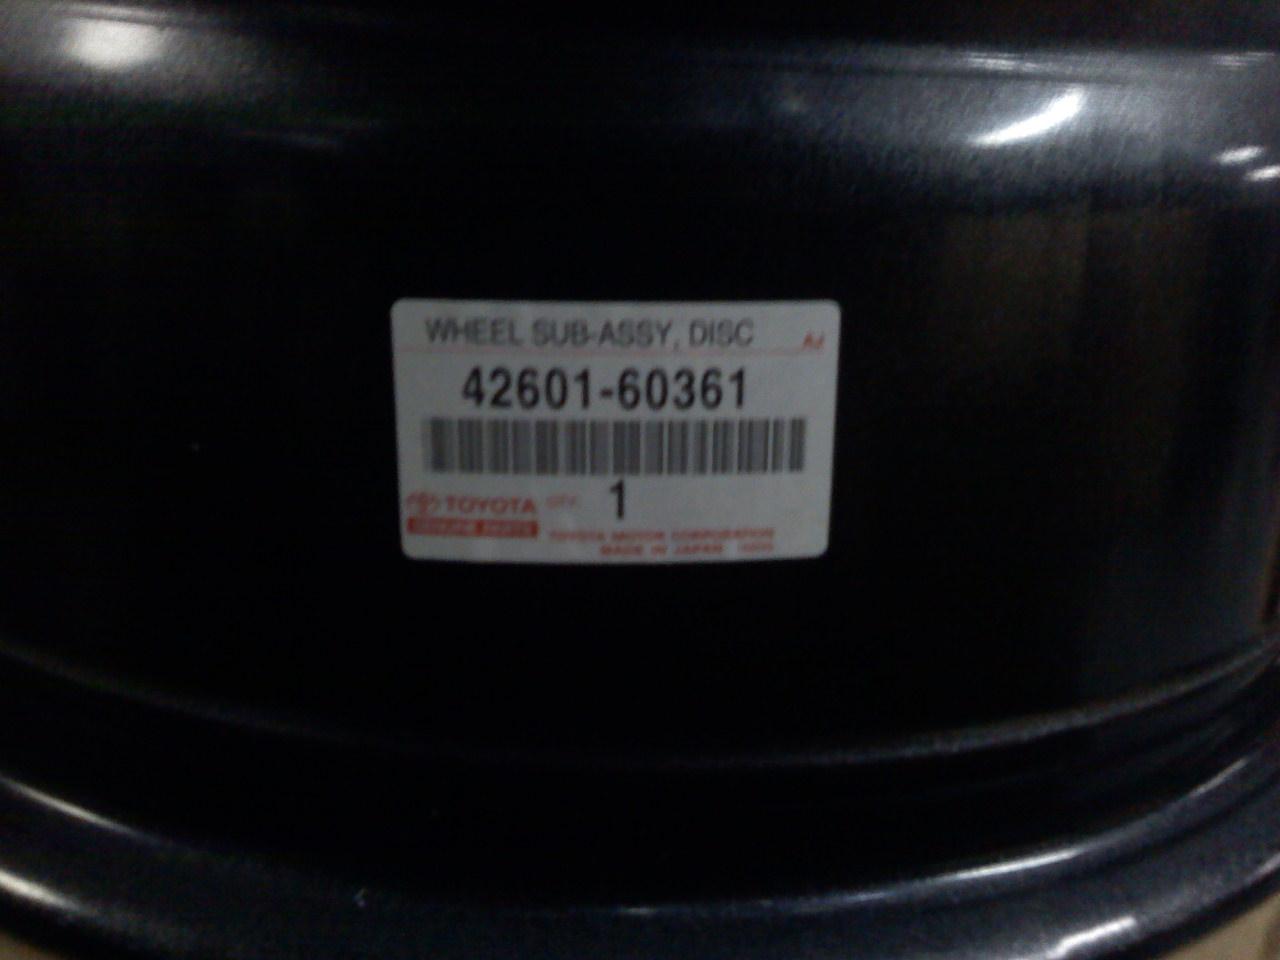 BC0F7C25-1673-4218-9695-7370FEFDE42C.jpeg